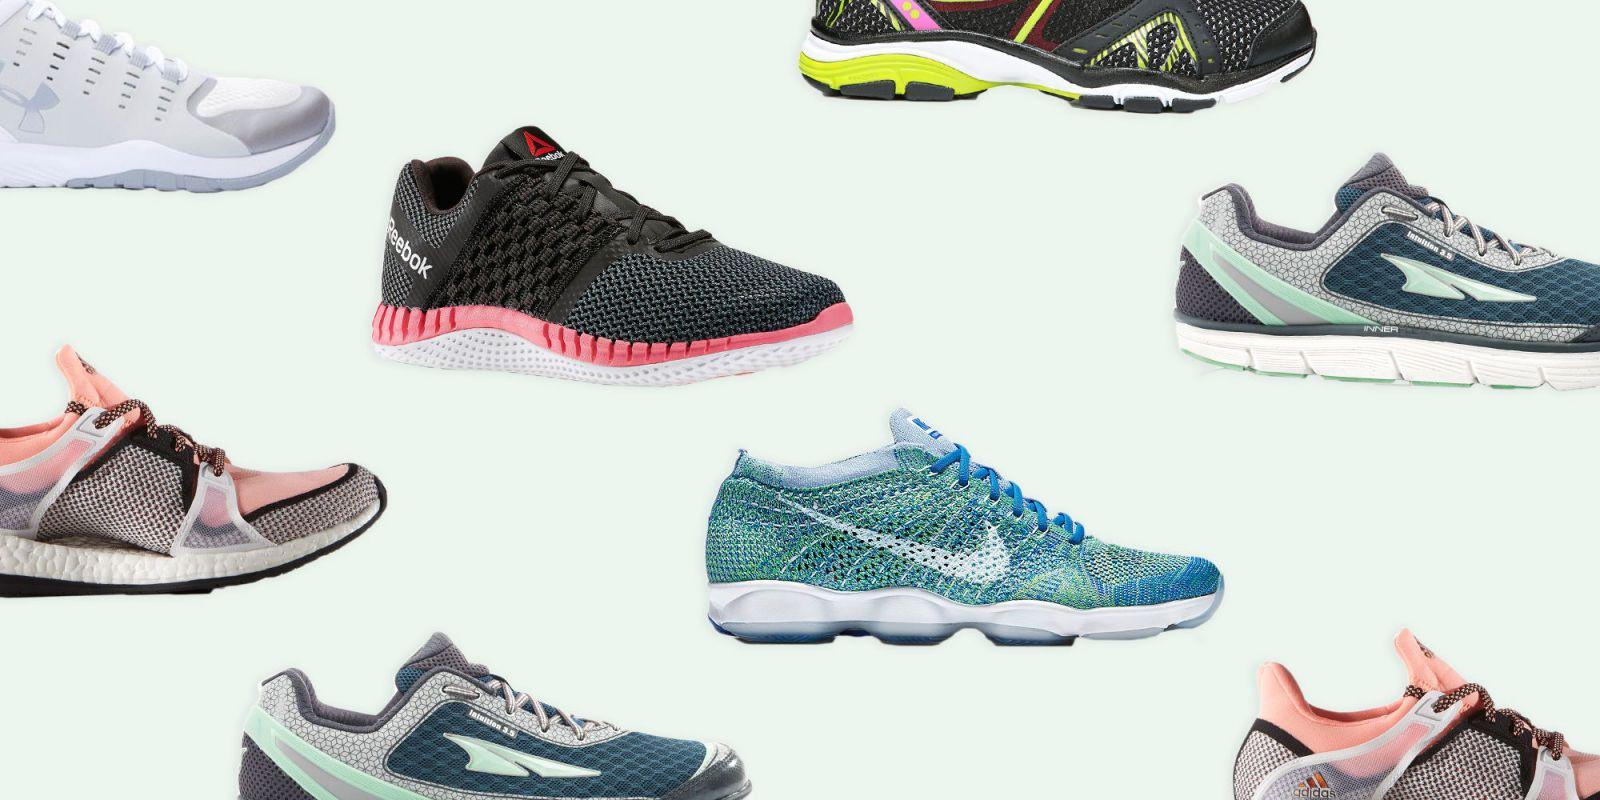 2019 S Best Cross Training Shoes For Women Cross Training Shoes